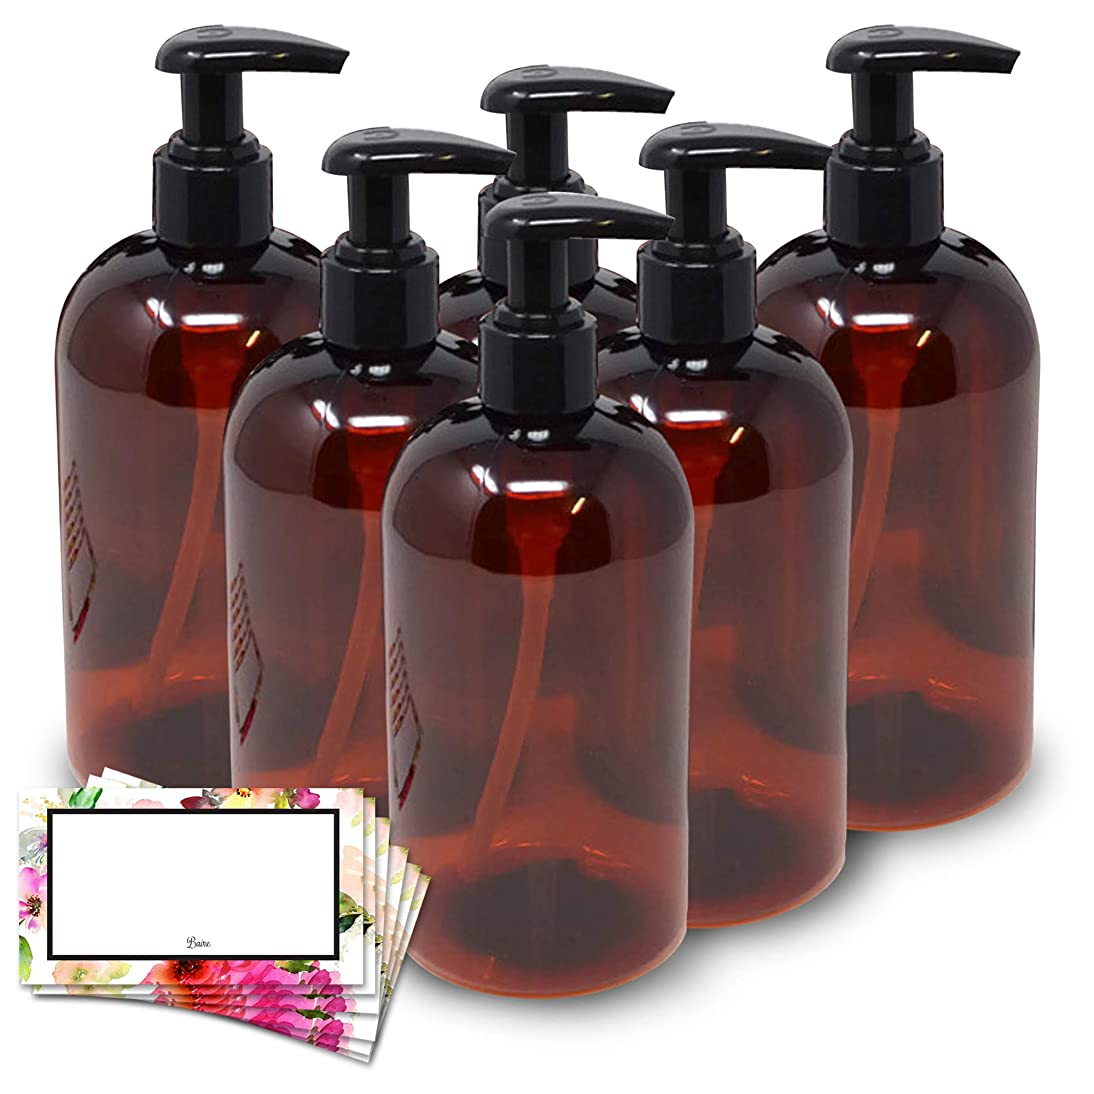 BAIRE BOTTLES - 8 OZ BROWN AMBER PLASTIC REFILLABLE BOTTLE with BLACK LOTION Pumps - ORGANIZE Soap, Shampoo and Lotion - PET, Lightweight, BPA Free - 6 Pack, BONUS 6 FLORAL LABELS